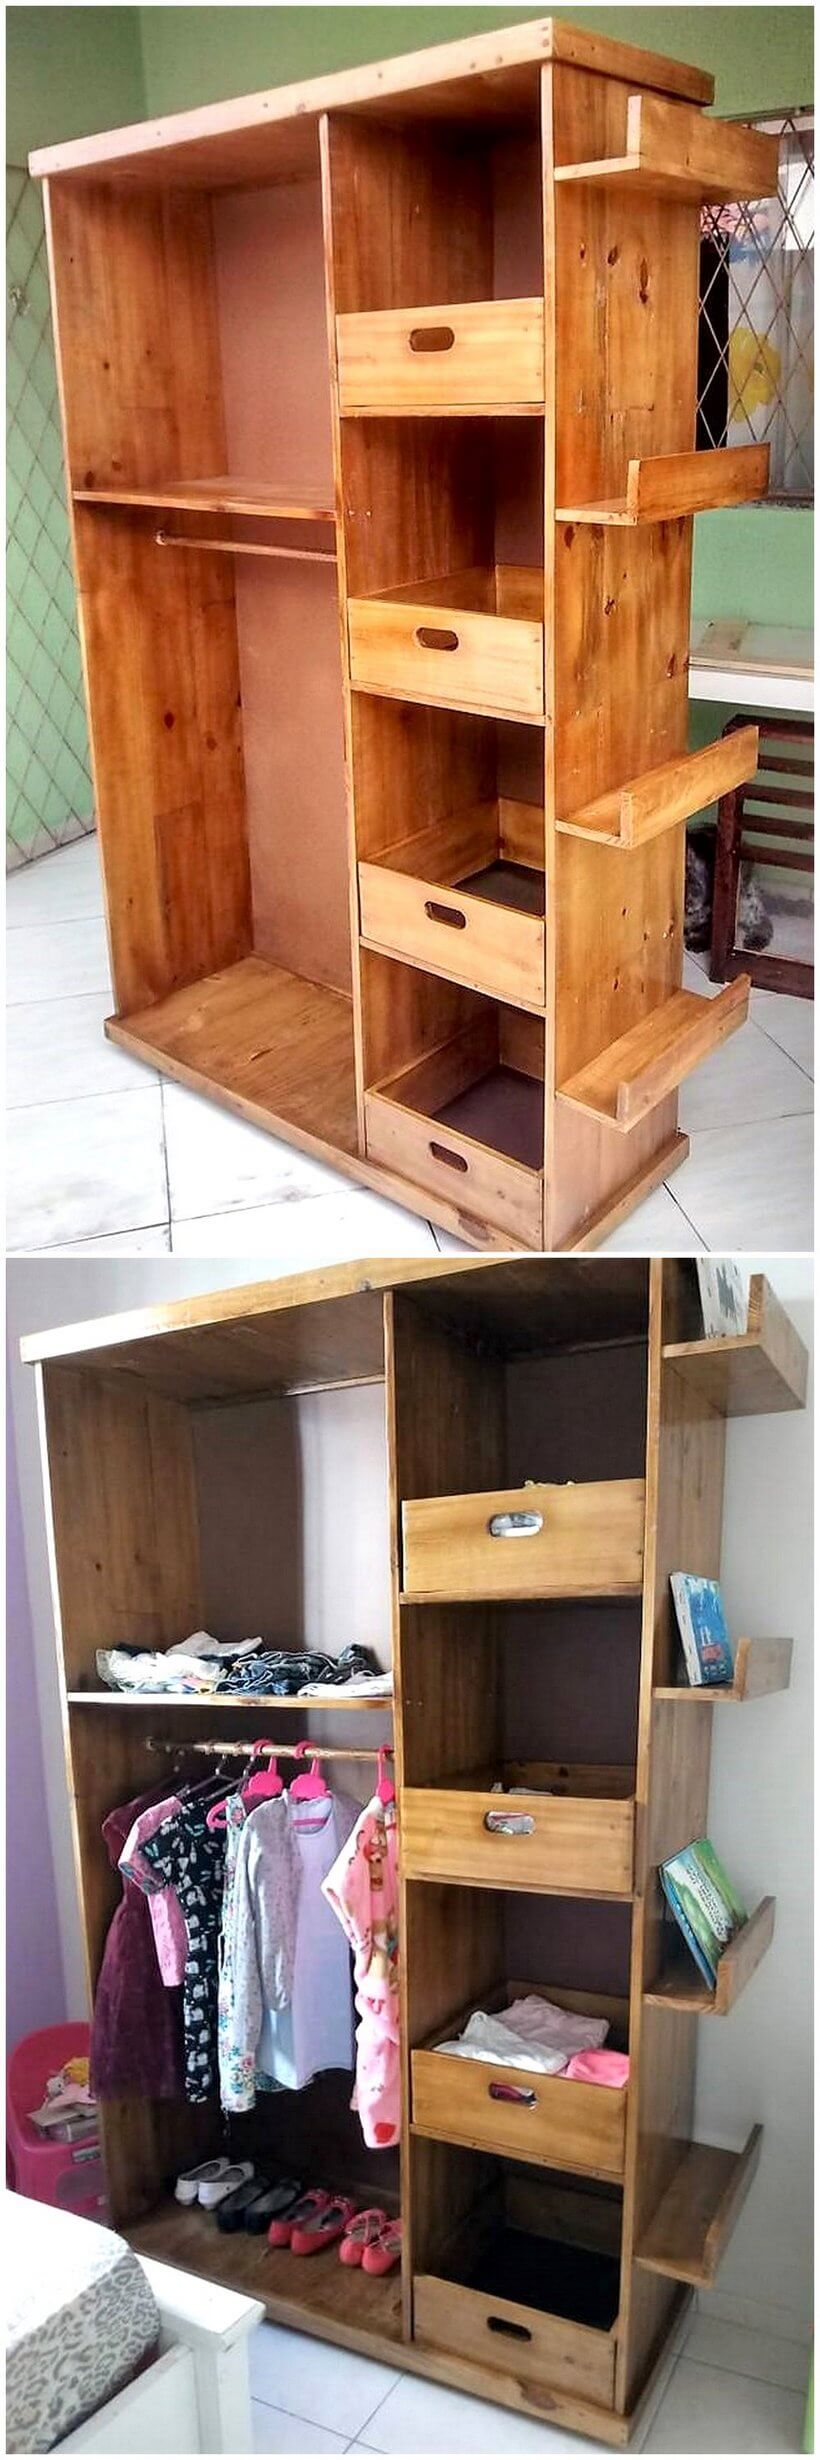 repurposed pallet closet project